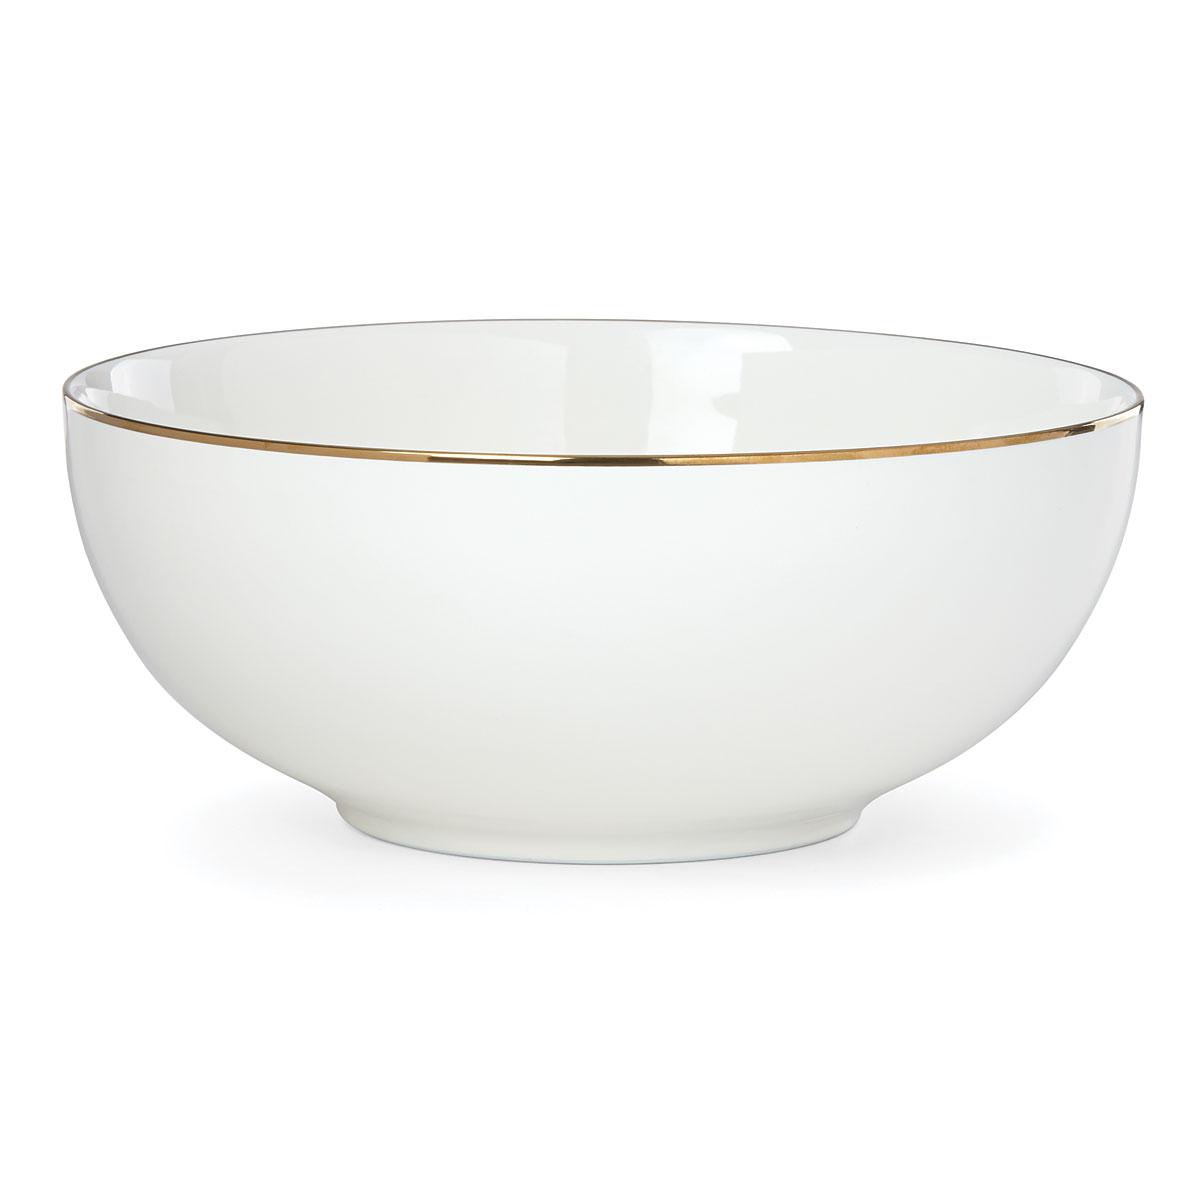 Lenox Trianna White Dinnerware Serving Bowl